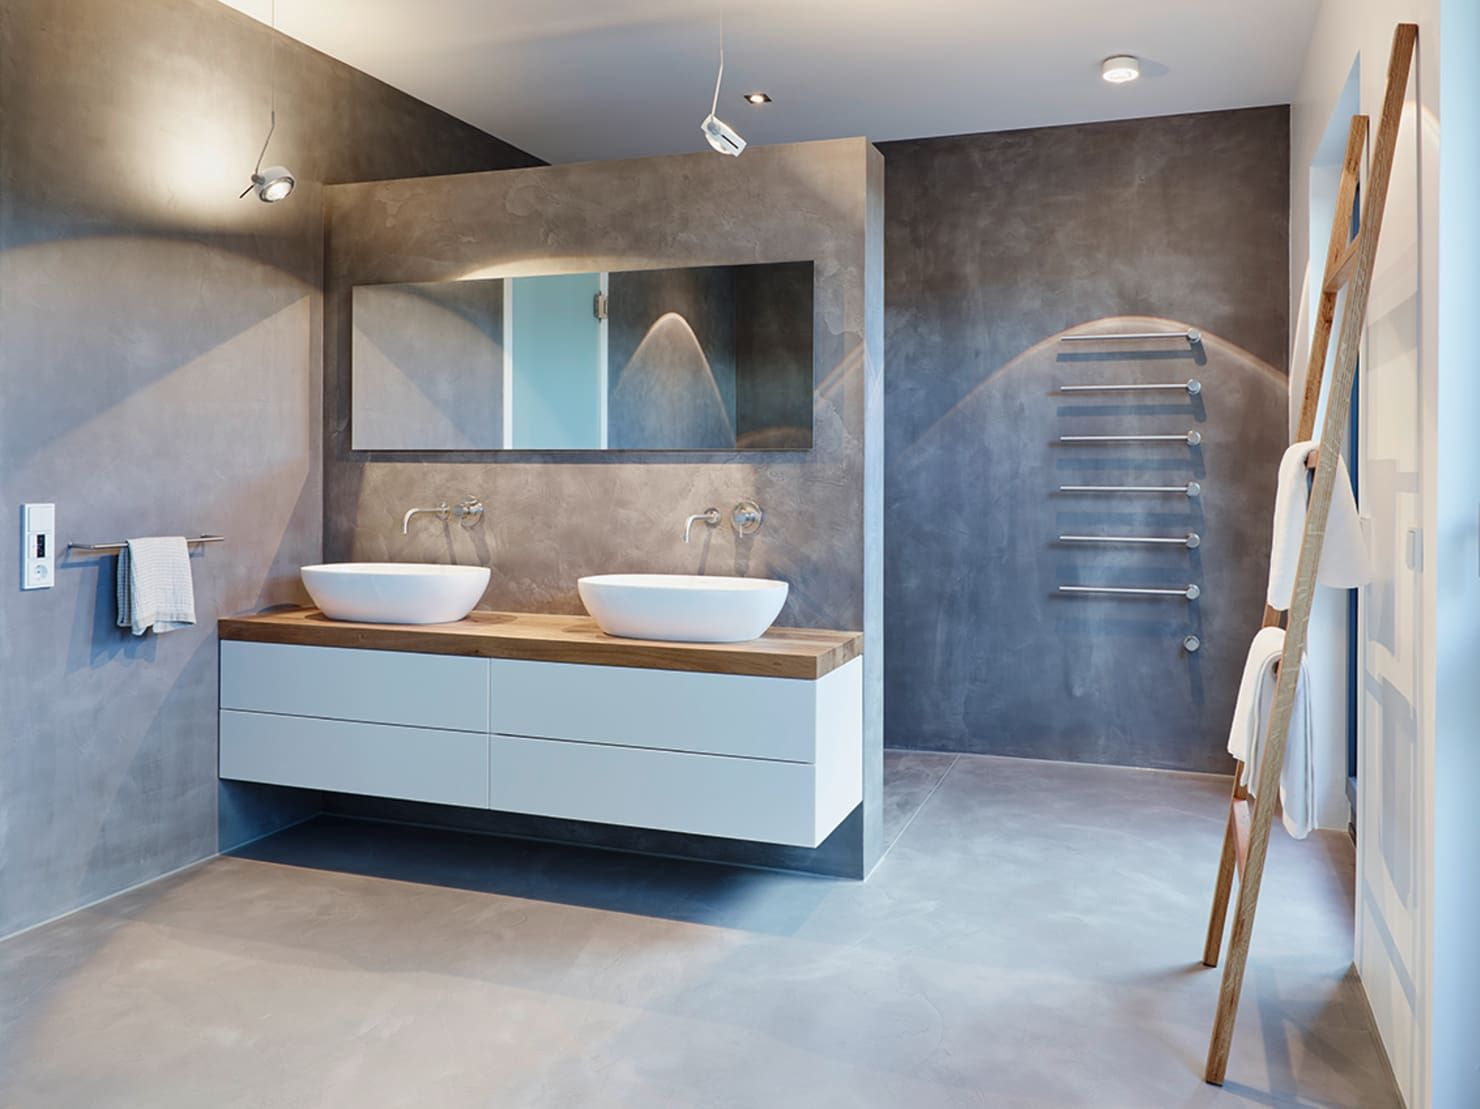 Meuble En Béton Ciré afbeeldingsresultaat voor salle de bain beton cire | meuble